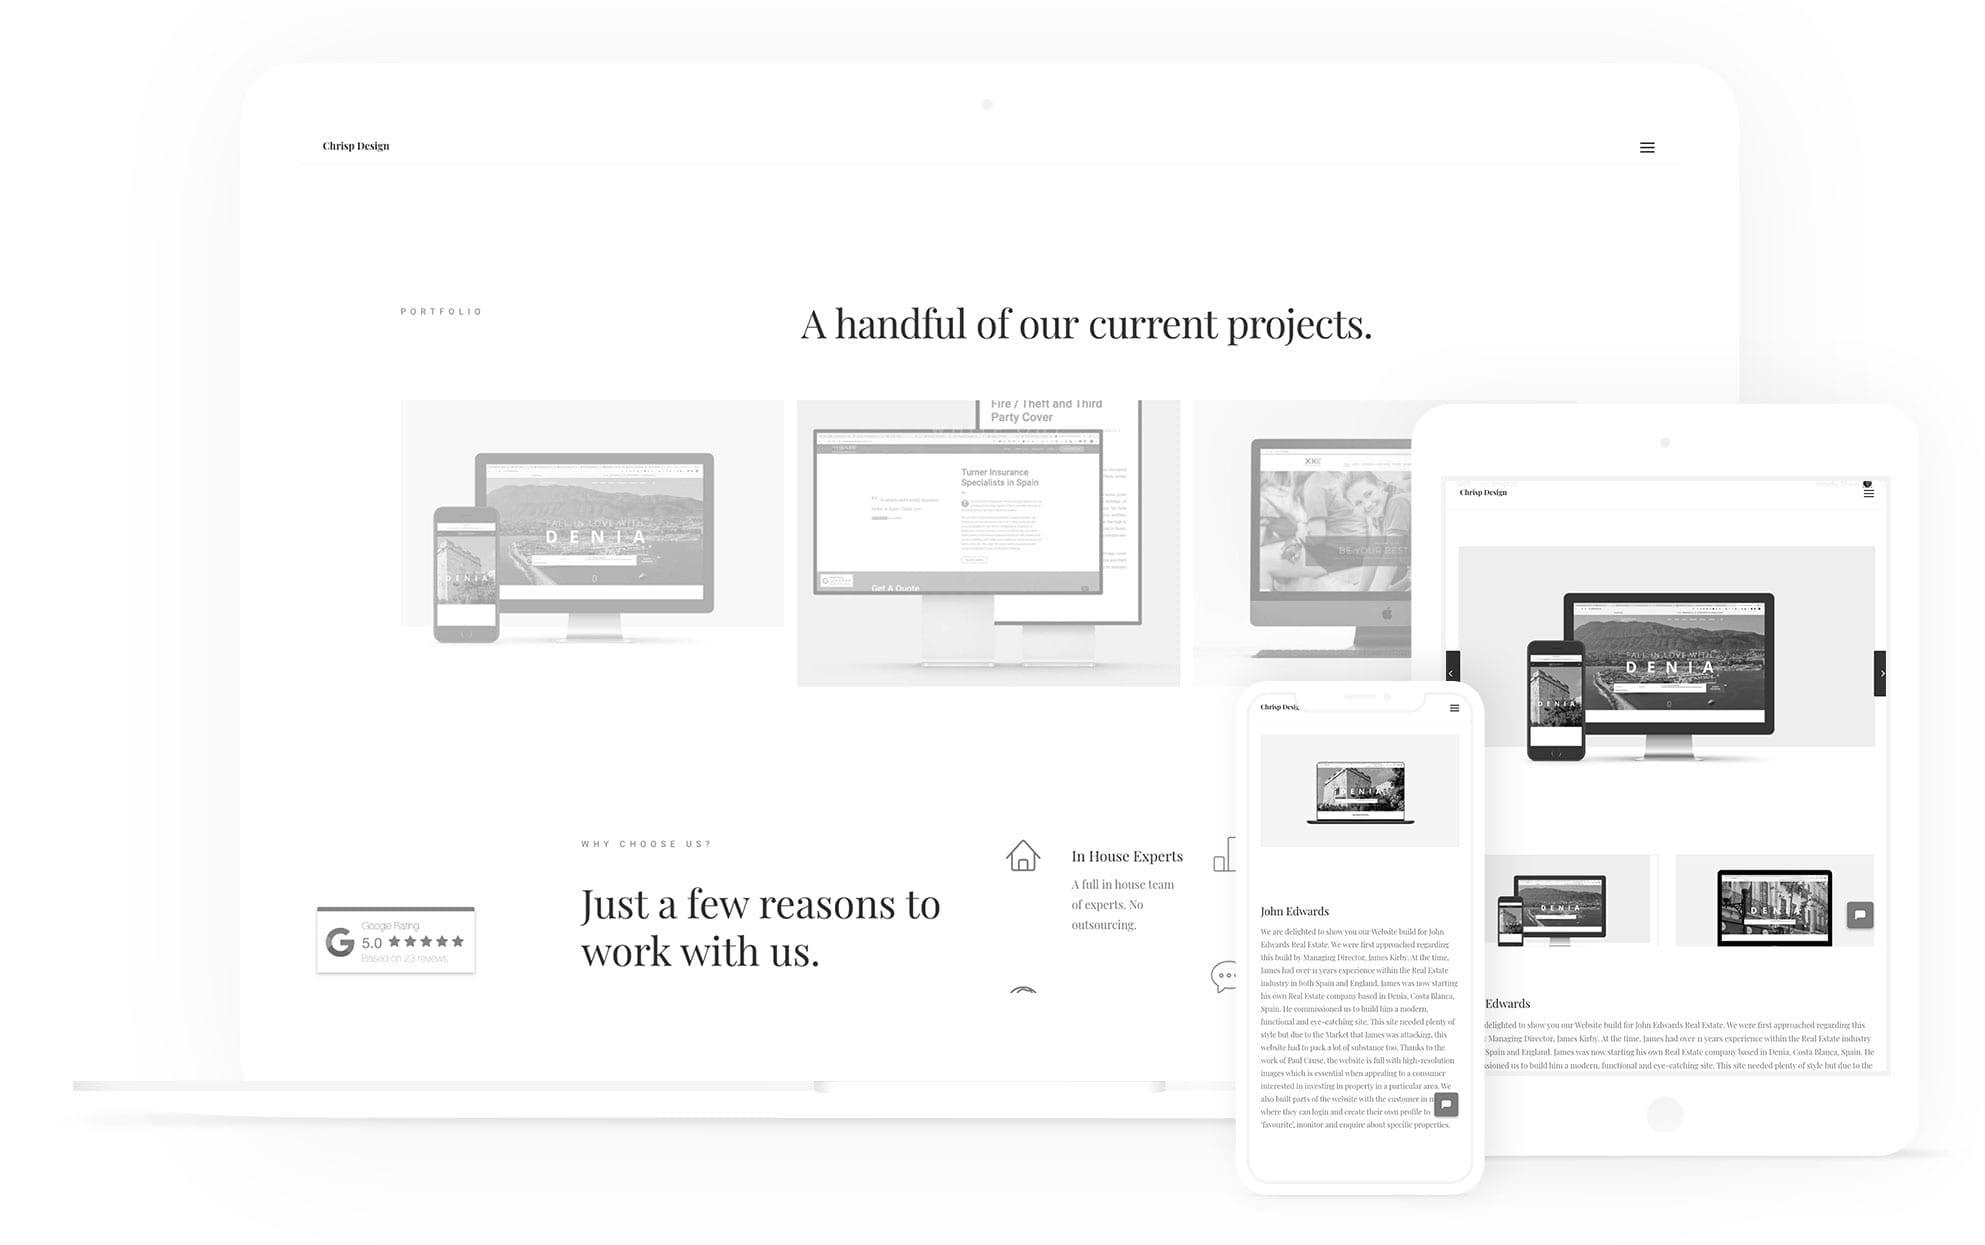 website mockup responsive design